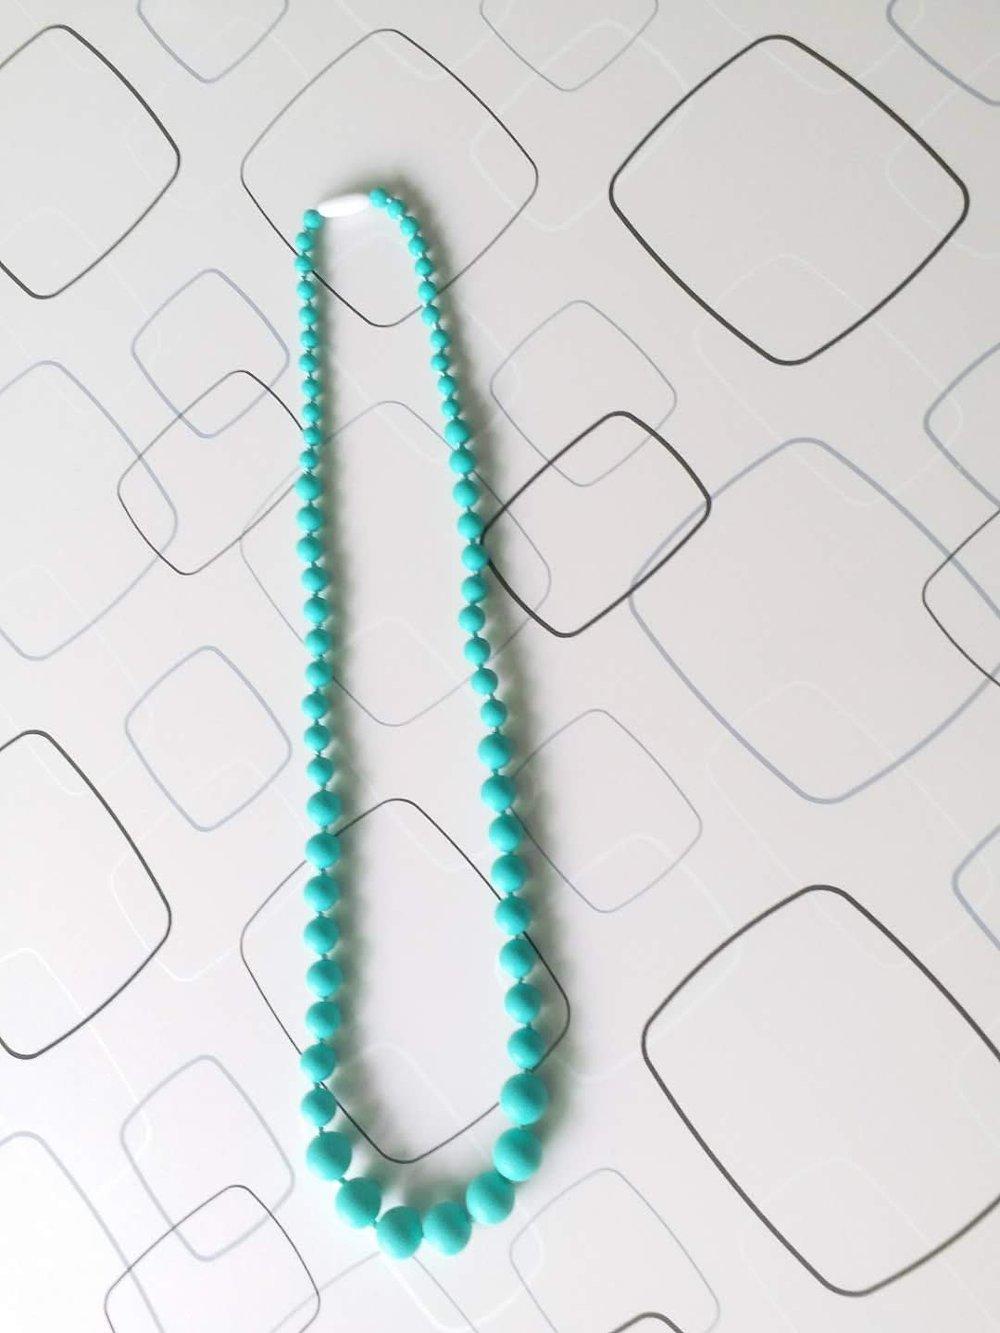 Collier de portage bébé – Silicone bleu